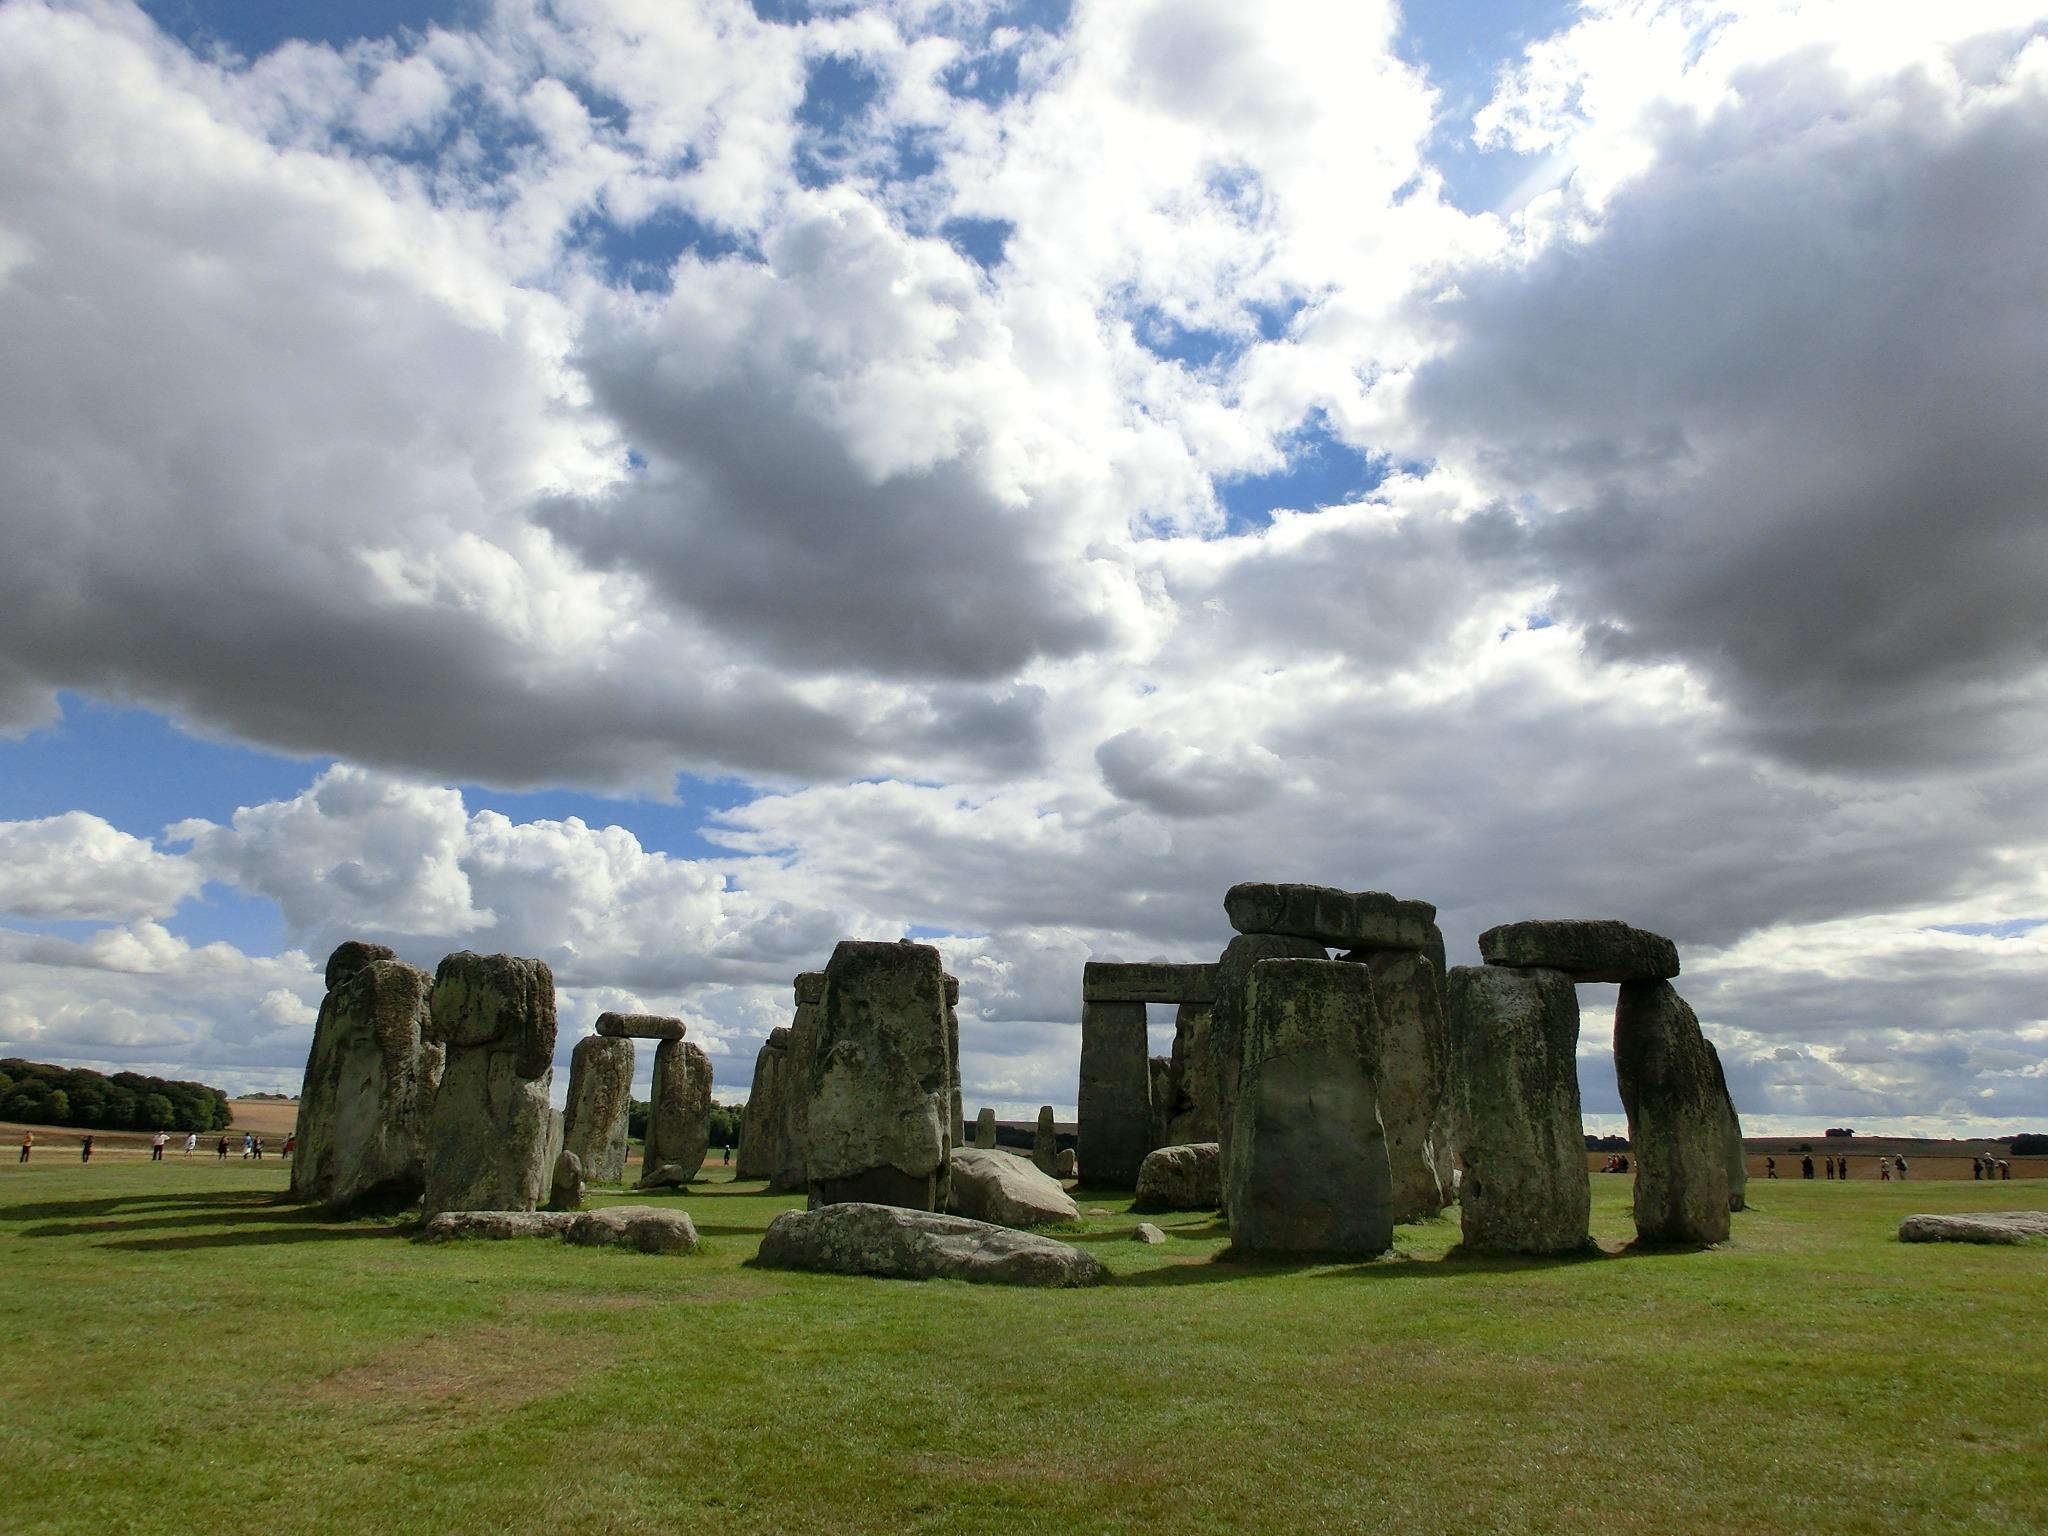 The Funniest TripAdvisor Reviews Of Iconic World Landmarks